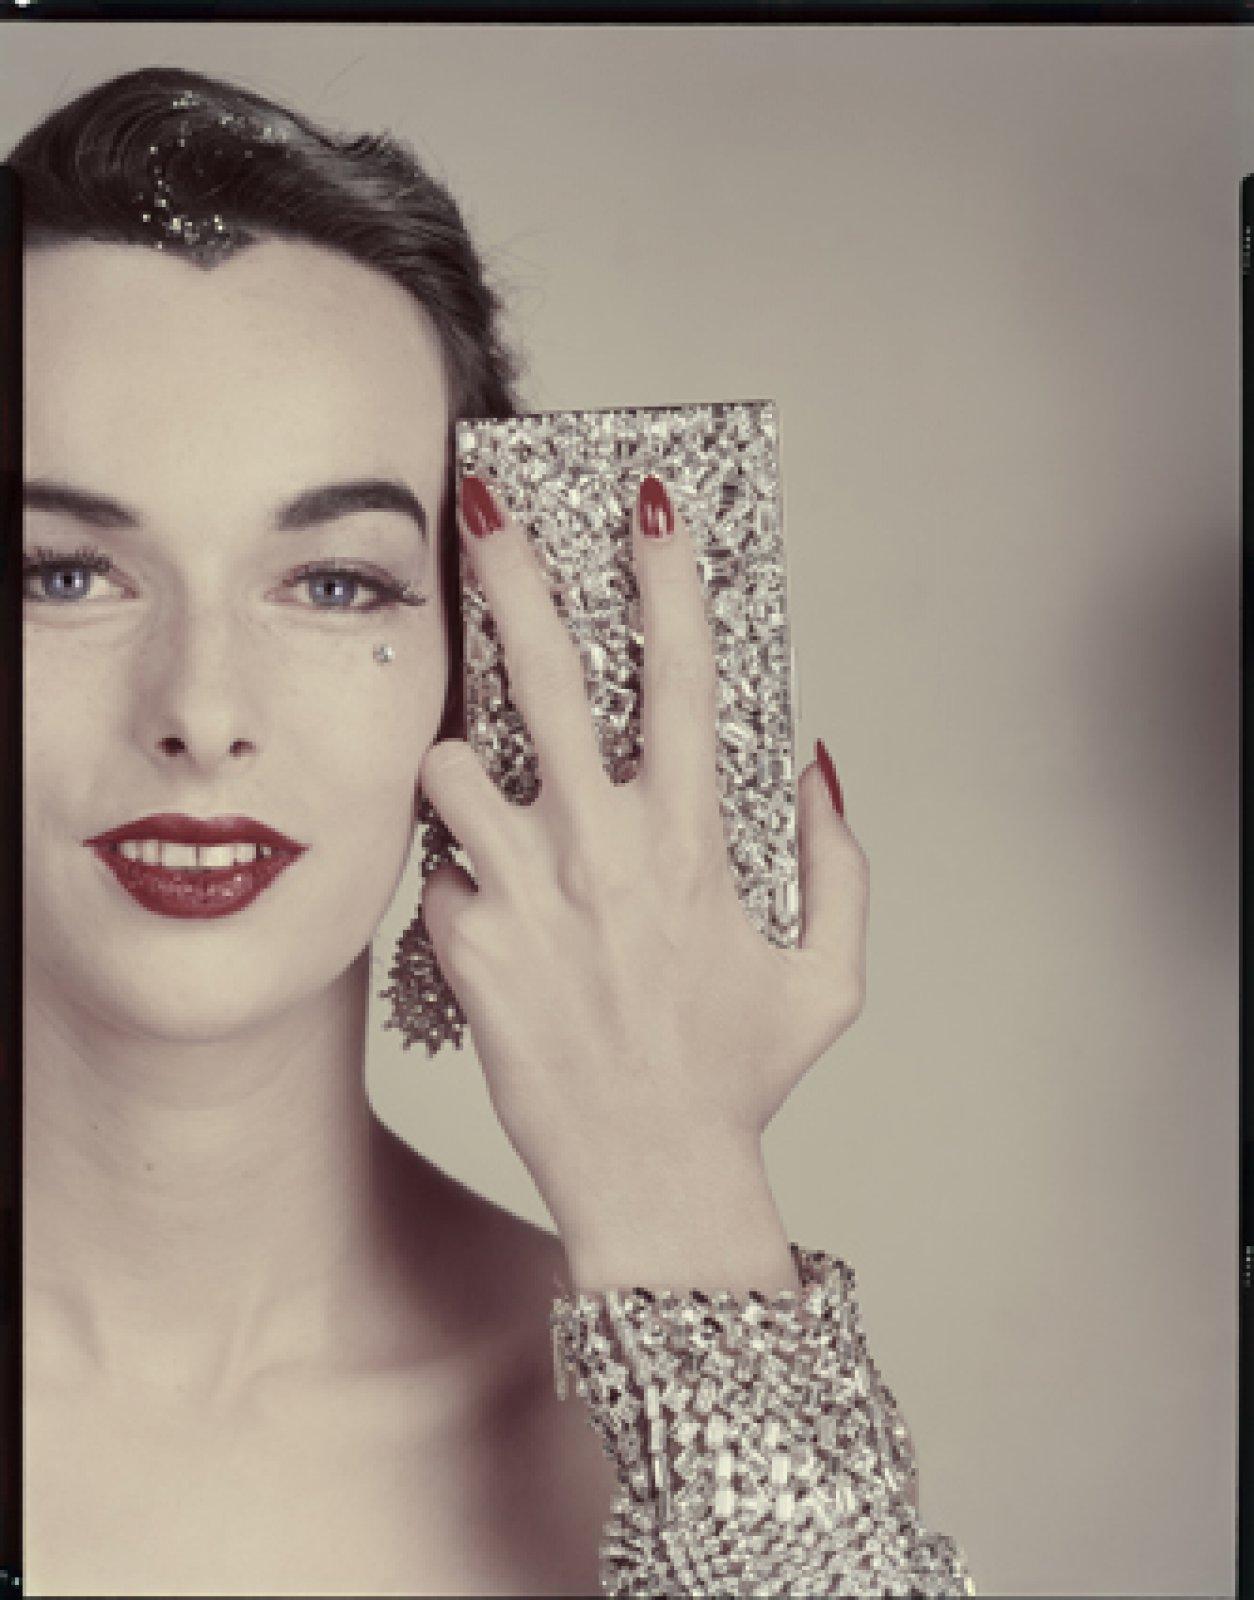 Minaudière Evans. Earrings Ledo. Bracelet Henri Bendel (model : Victoria von Hagen). > Variant of the photograph published in the article